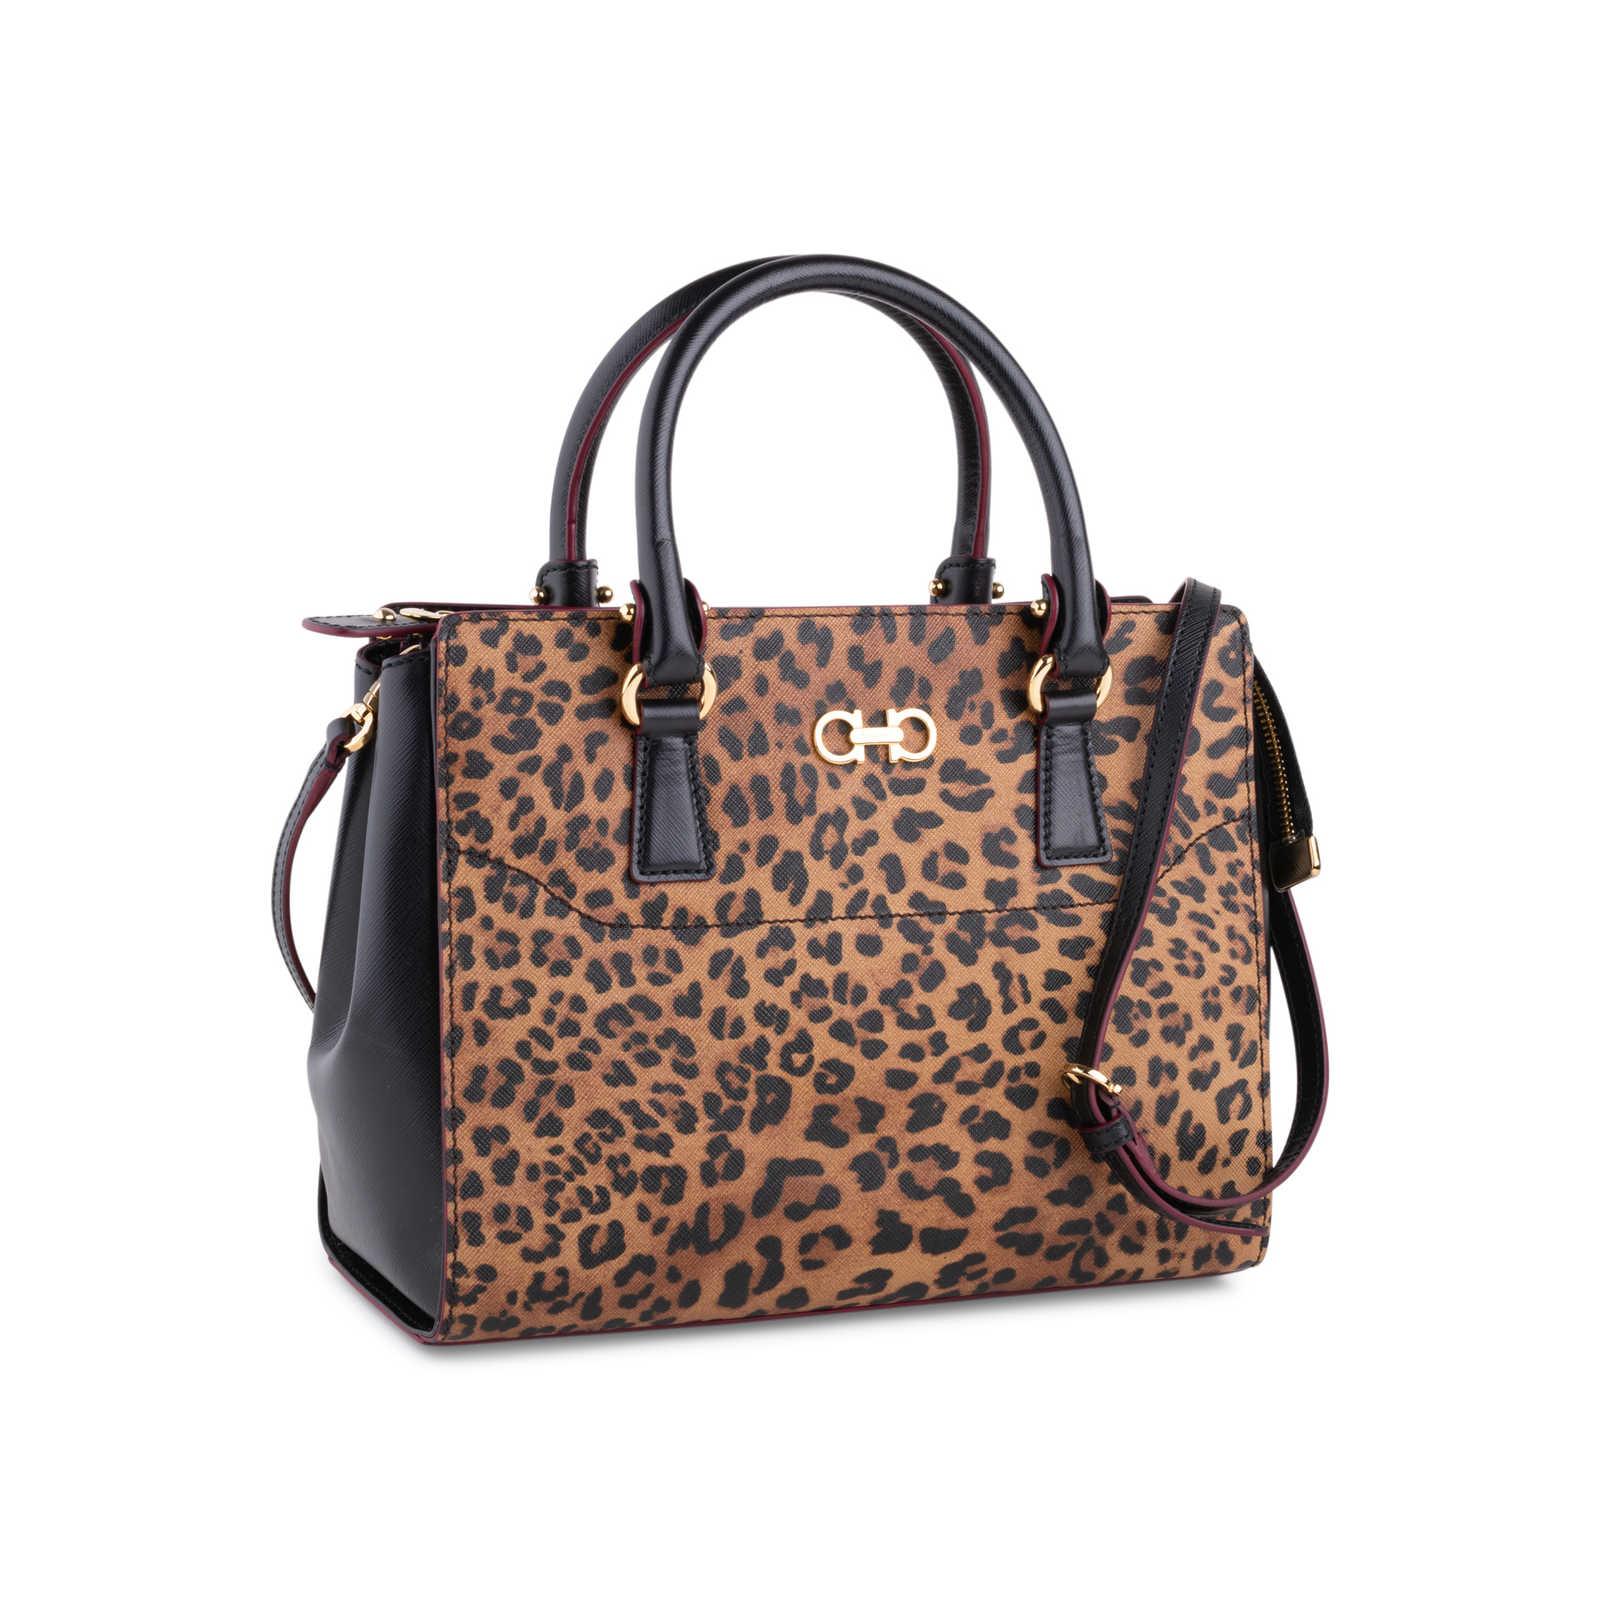 b0e19017b0 ... Authentic Second Hand Salvatore Ferragamo Leopard Beky Tote  (PSS-630-00015) ...